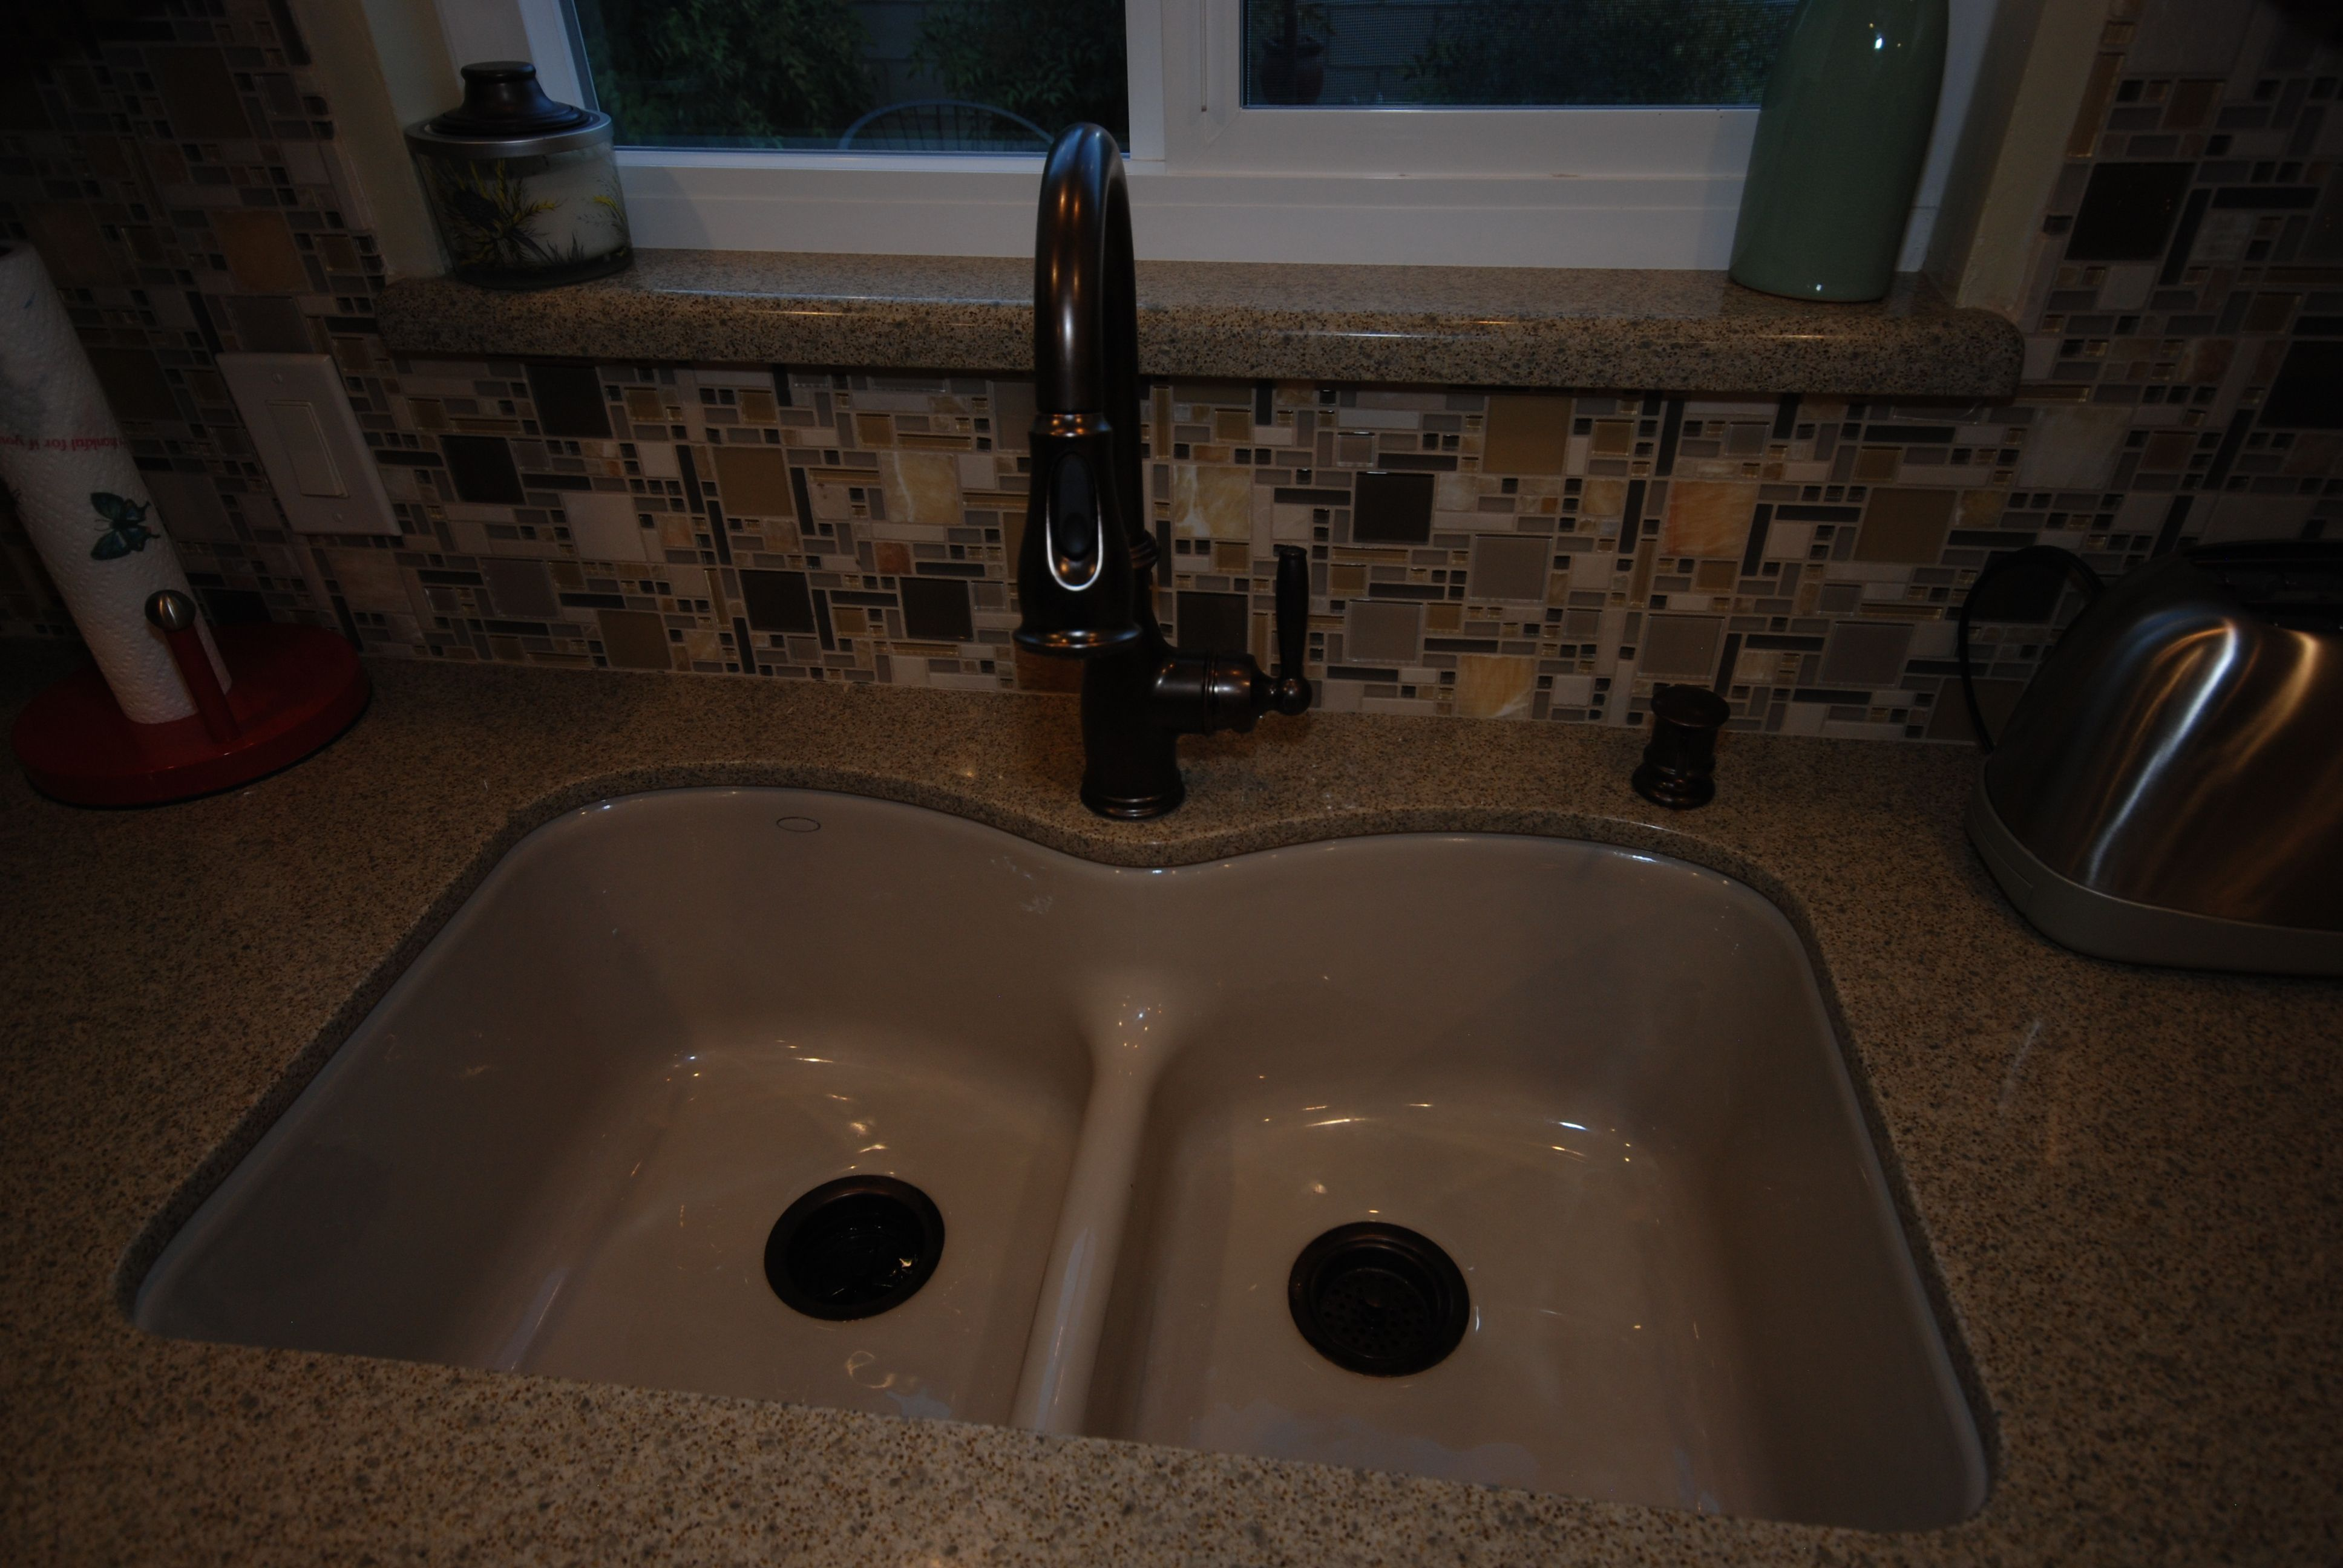 Kohler brookfield kitchen sink - Kohler Langlade Sink In Sandbar In Zodiaq Mossy Green Quartz Moen Faucet In Orb